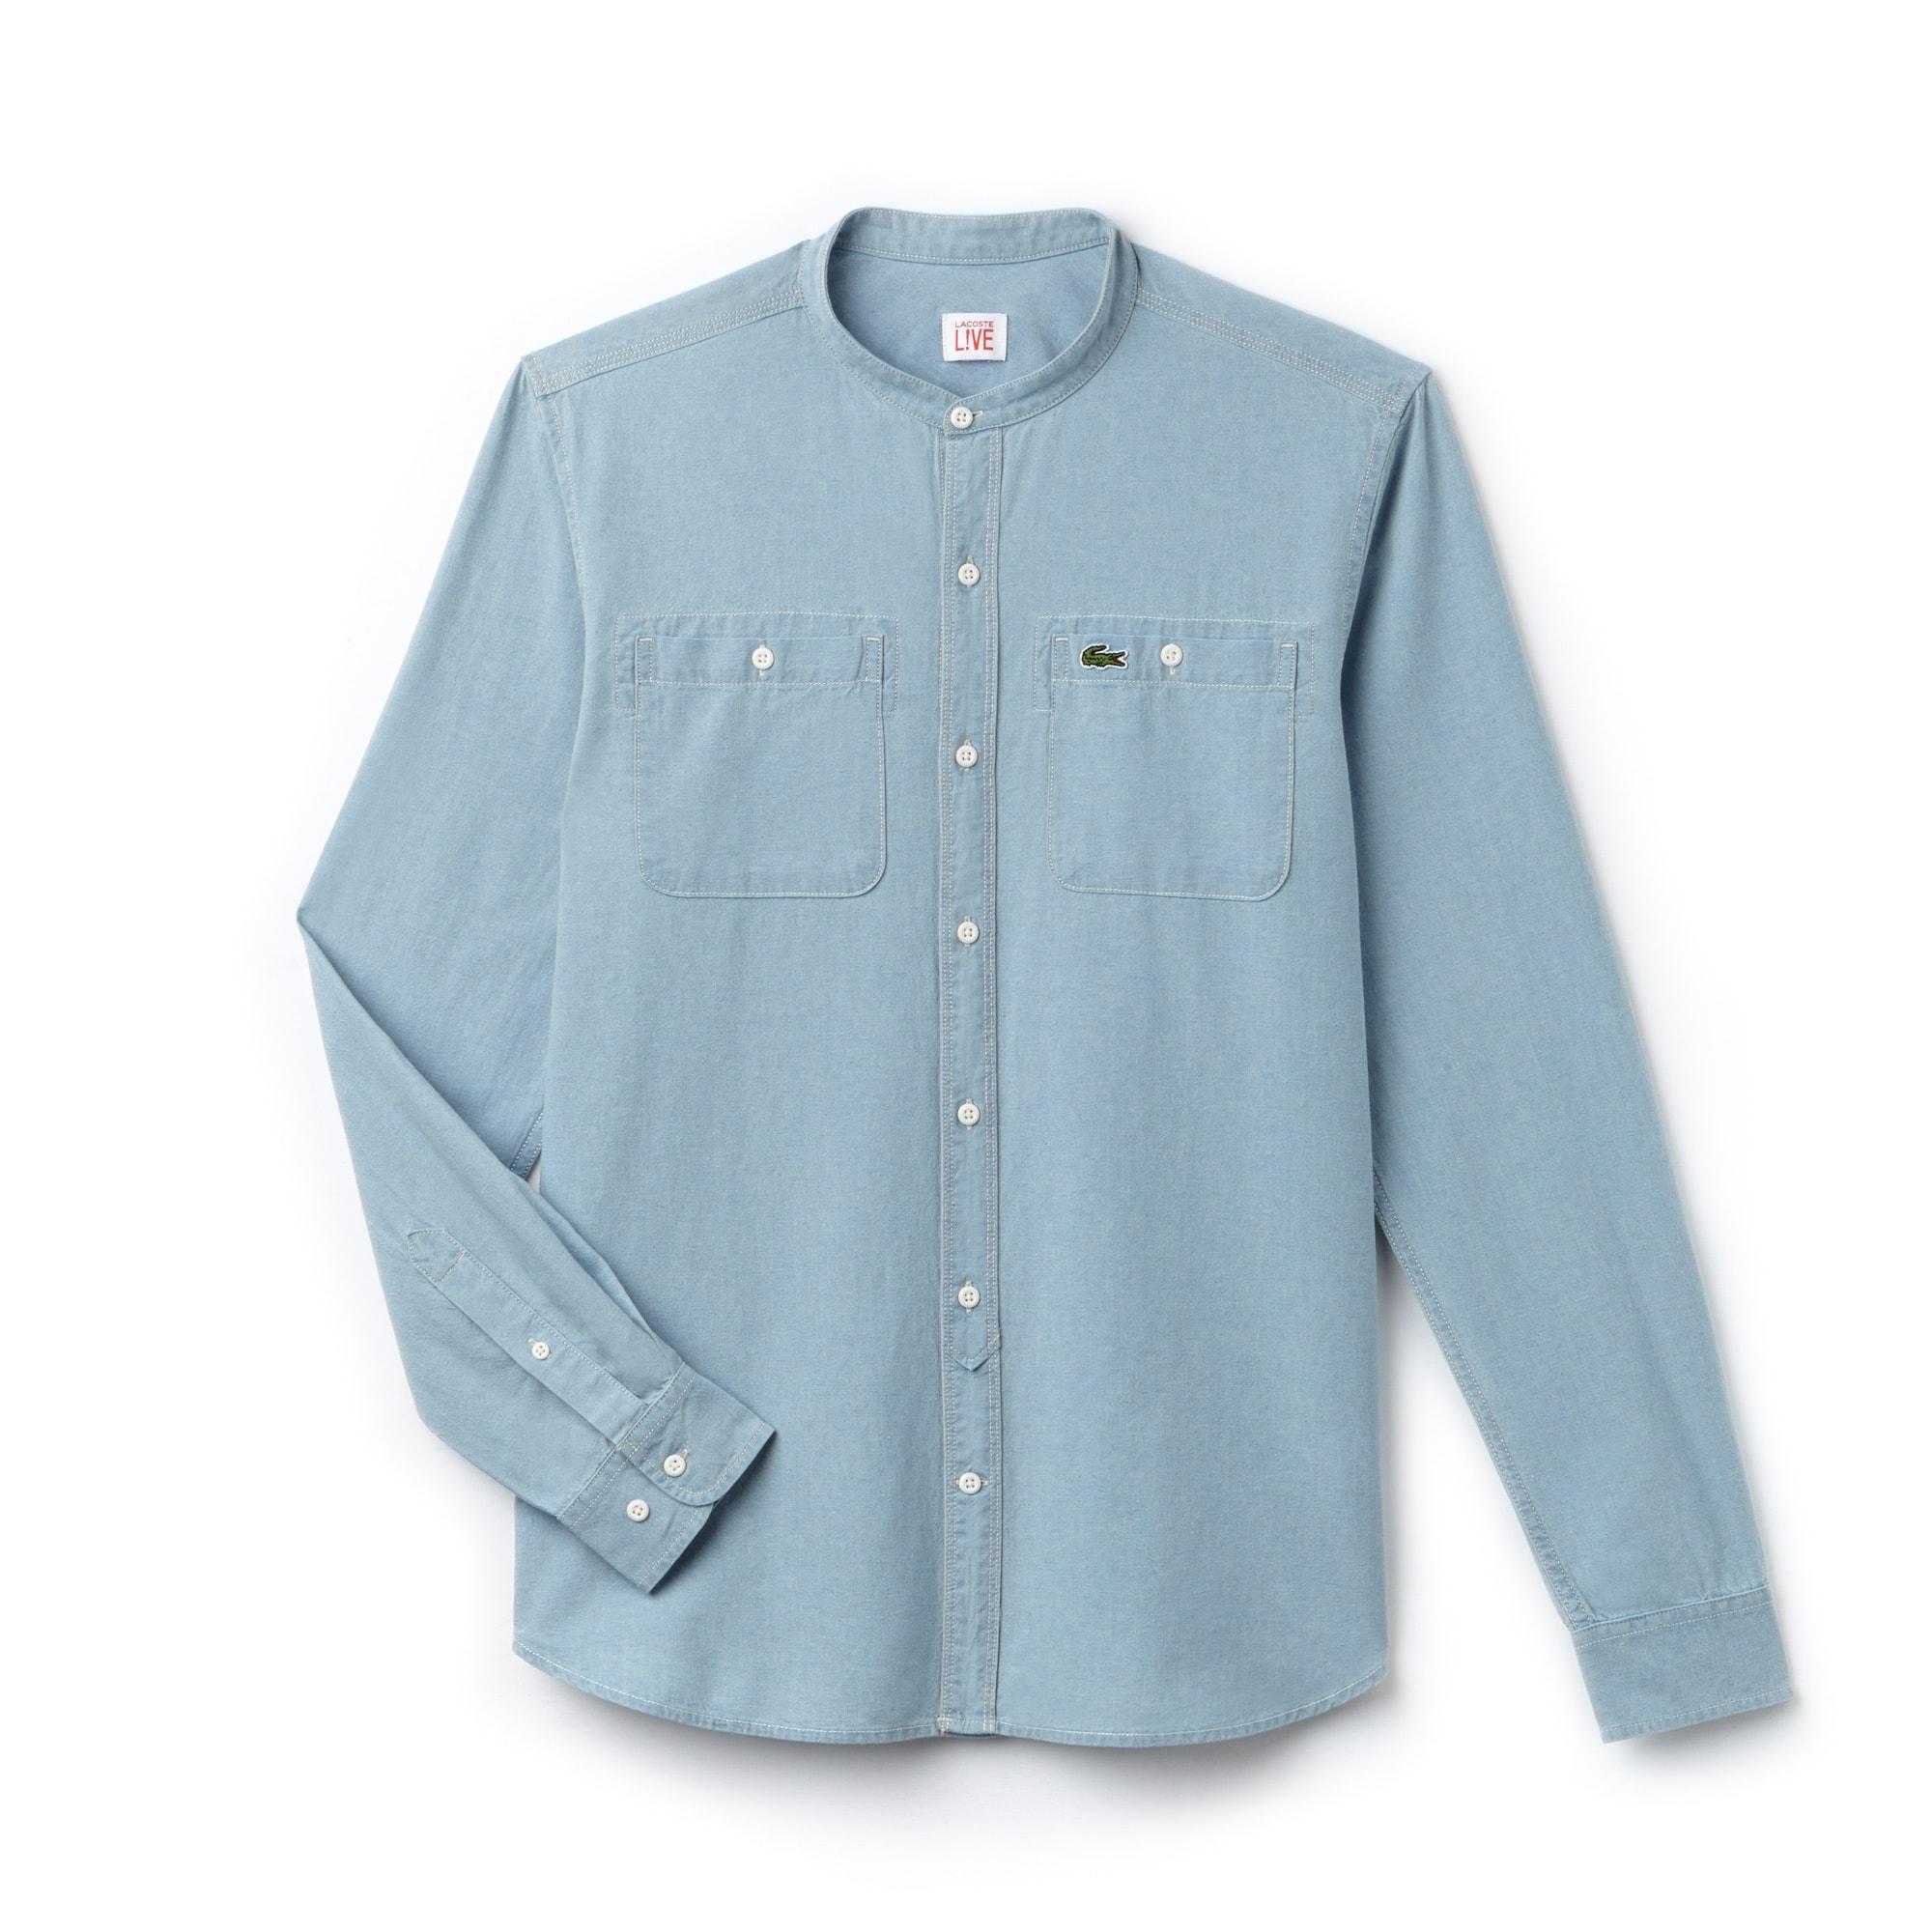 Skinny Fit Herren-Hemd aus Chambray mit Mao-Kragen LACOSTE L!VE